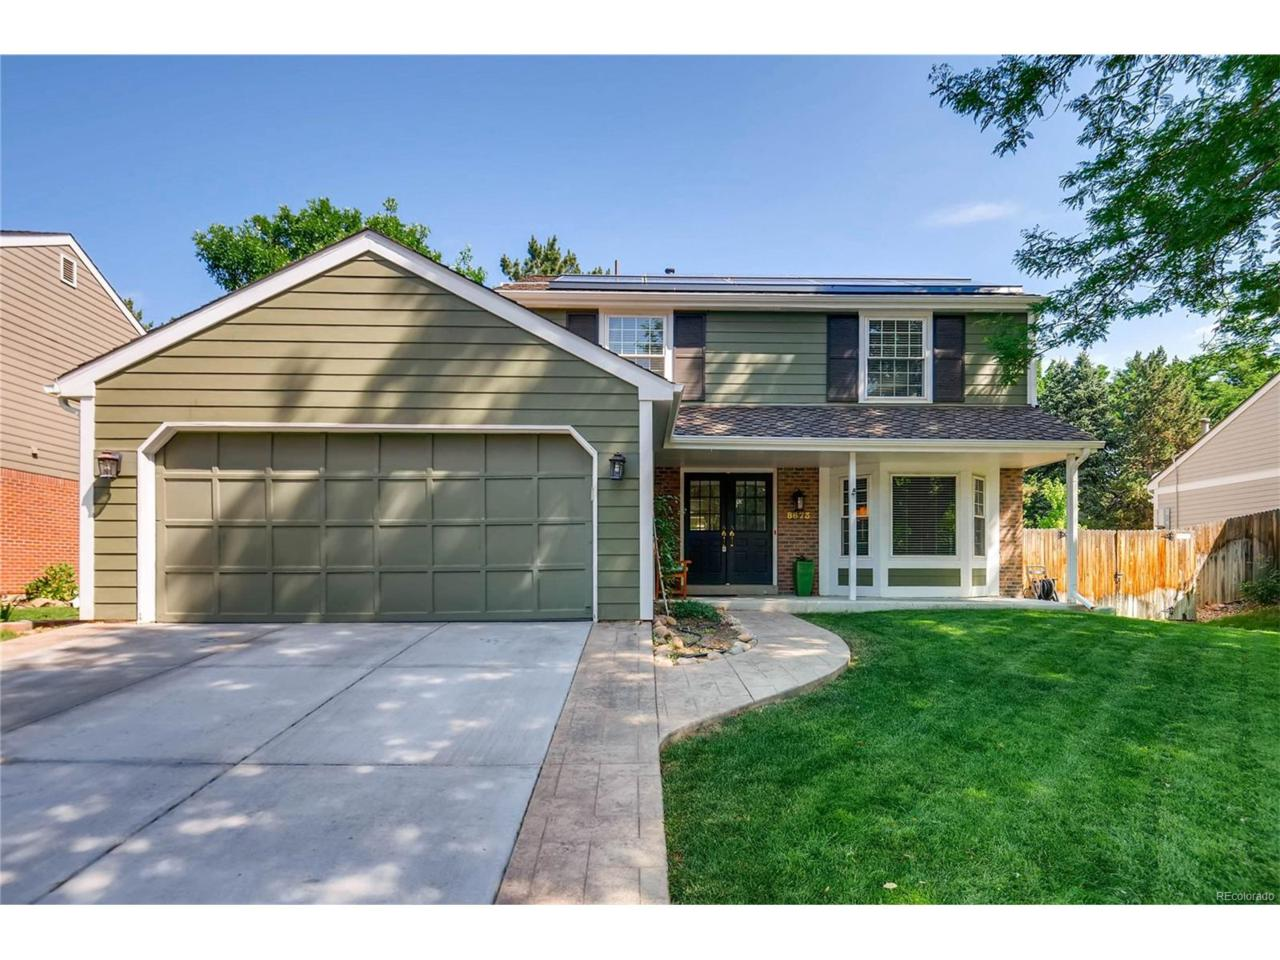 8673 W Progress Place, Littleton, CO 80123 (MLS #5805758) :: 8z Real Estate